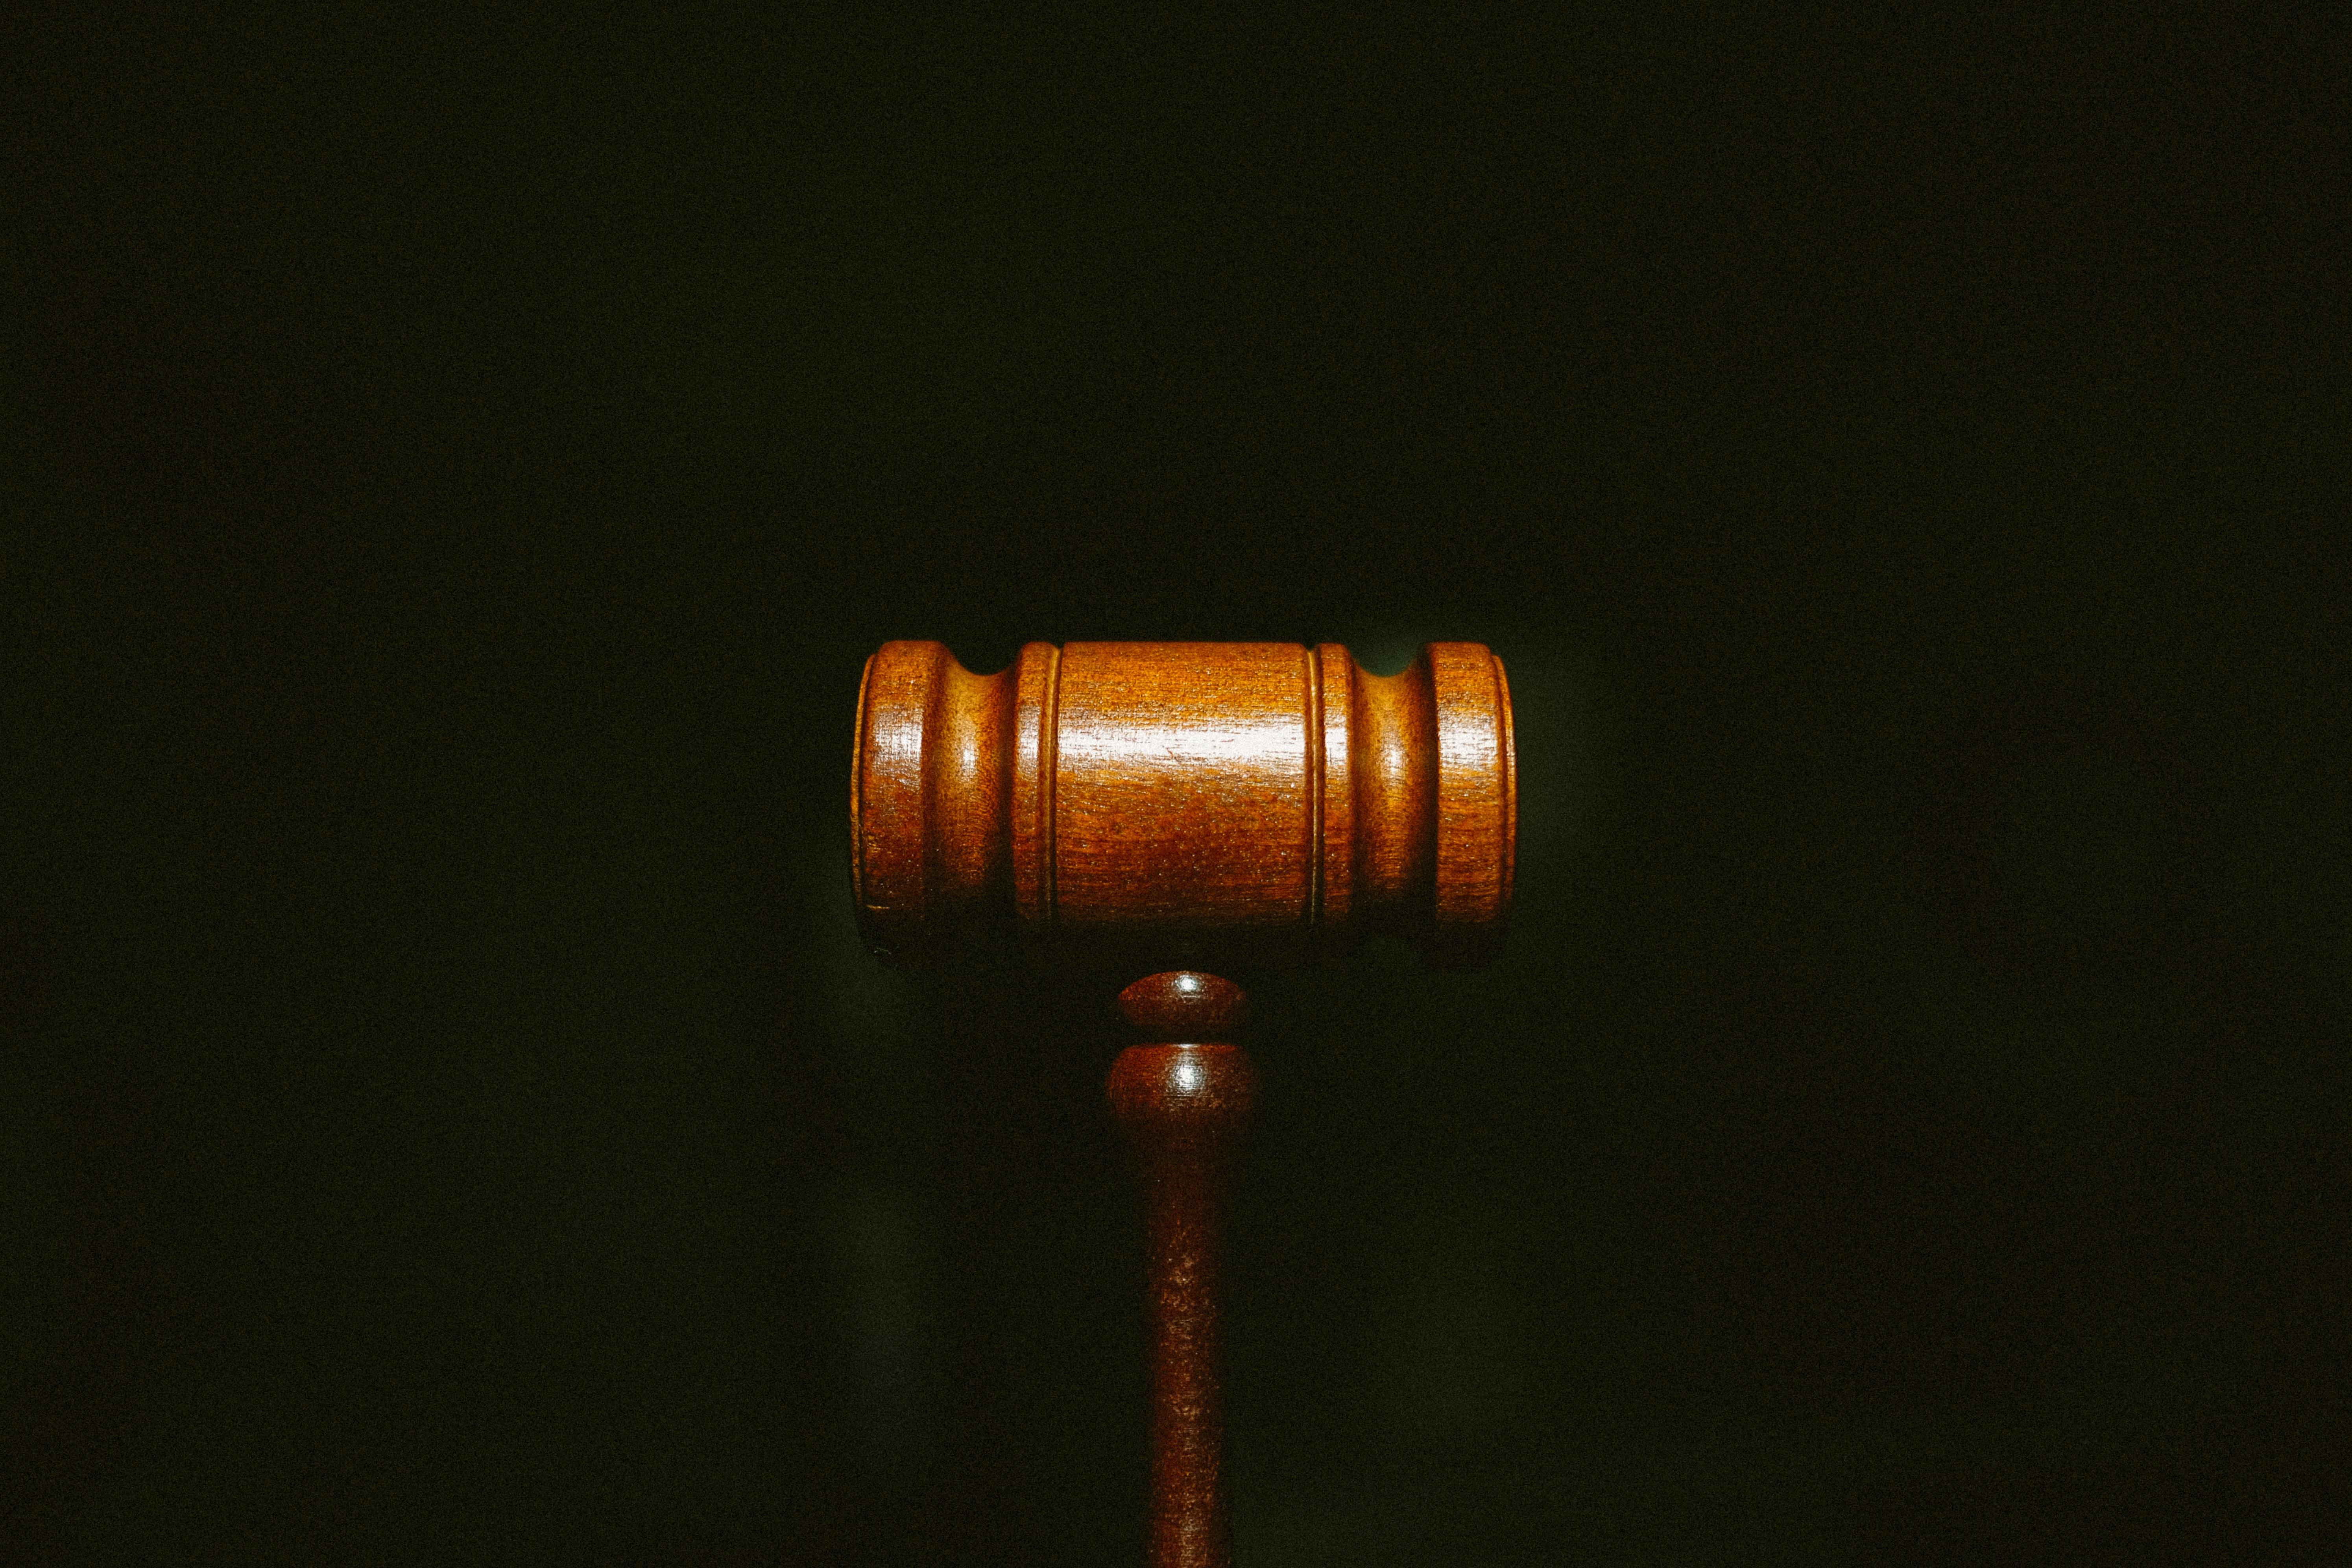 Graham's last stand? Senator leads Barrett court hearings